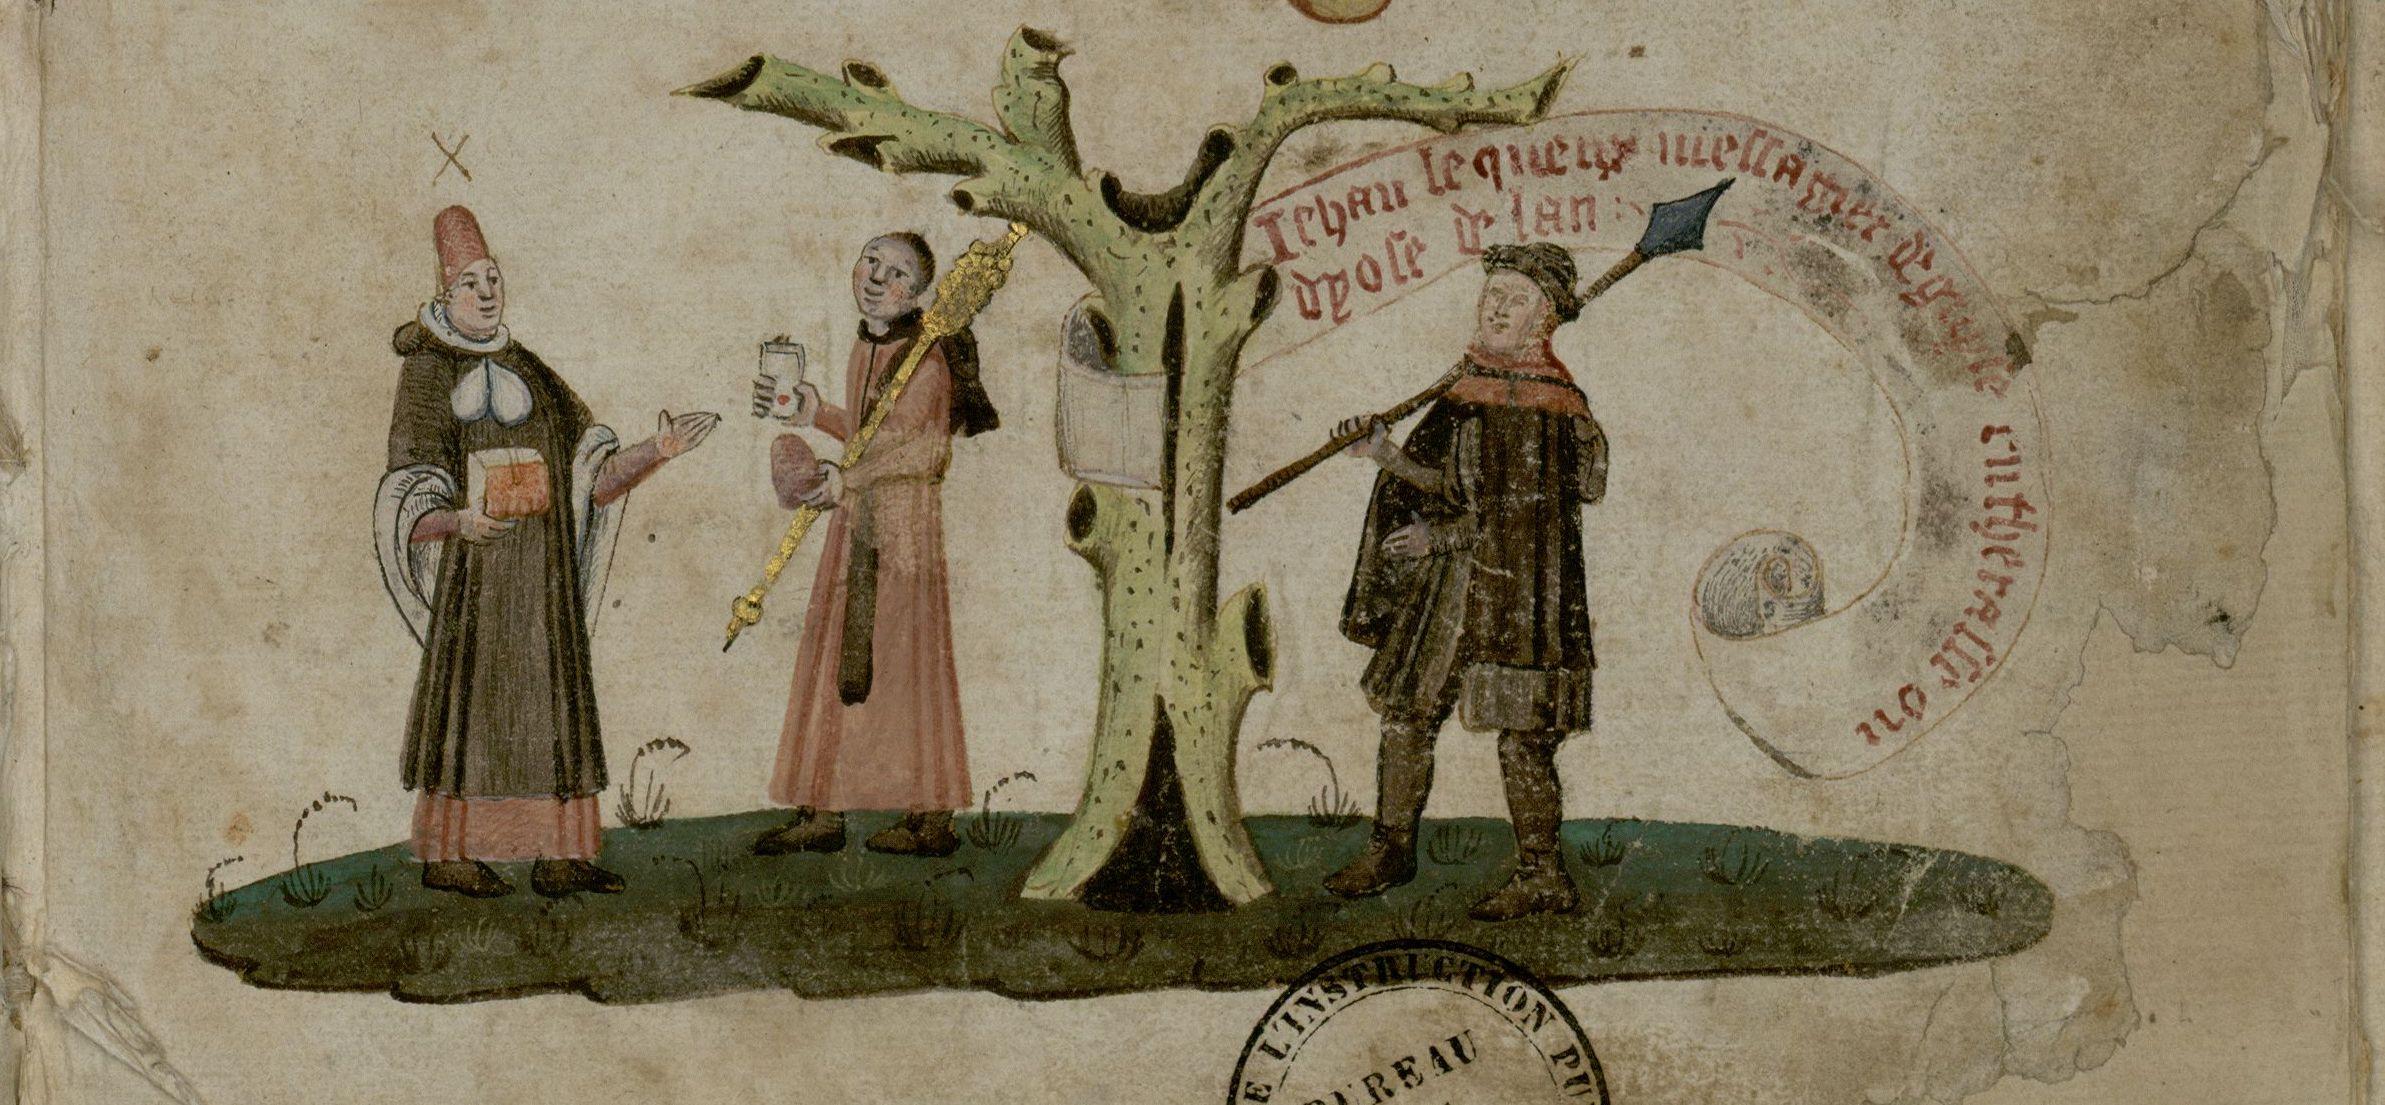 """Miniature from the ""Liber procuratorum"" of the Picard nation from 1476 (Arch. Sorb., Reg. 9, f. 1r). Cliché Bibliothèque de la Sorbonne."